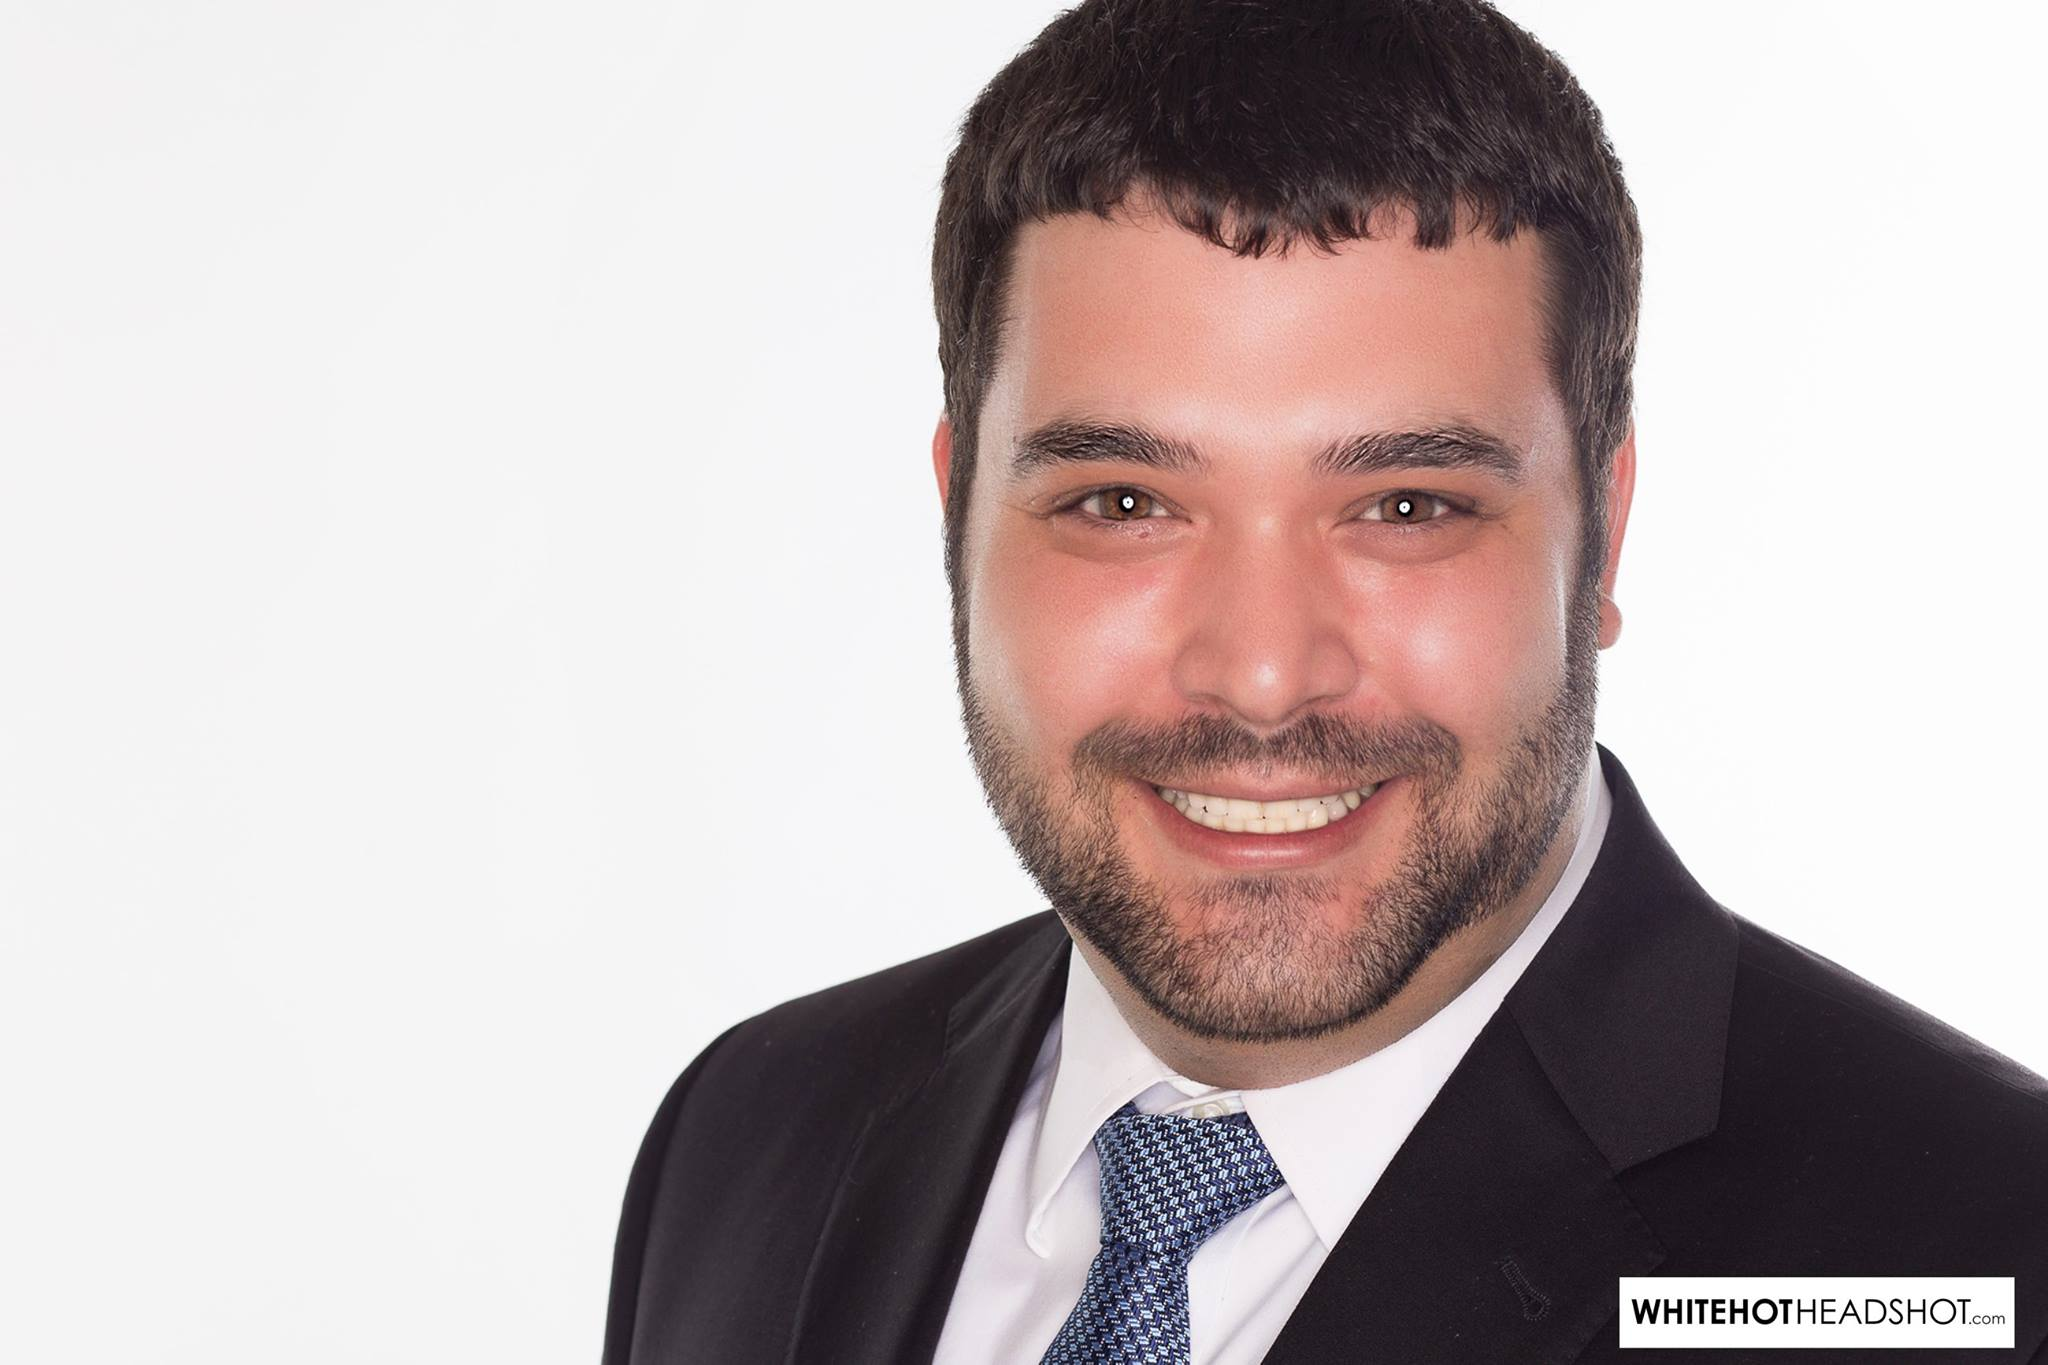 Michael Nickolich aka DJ Mikey